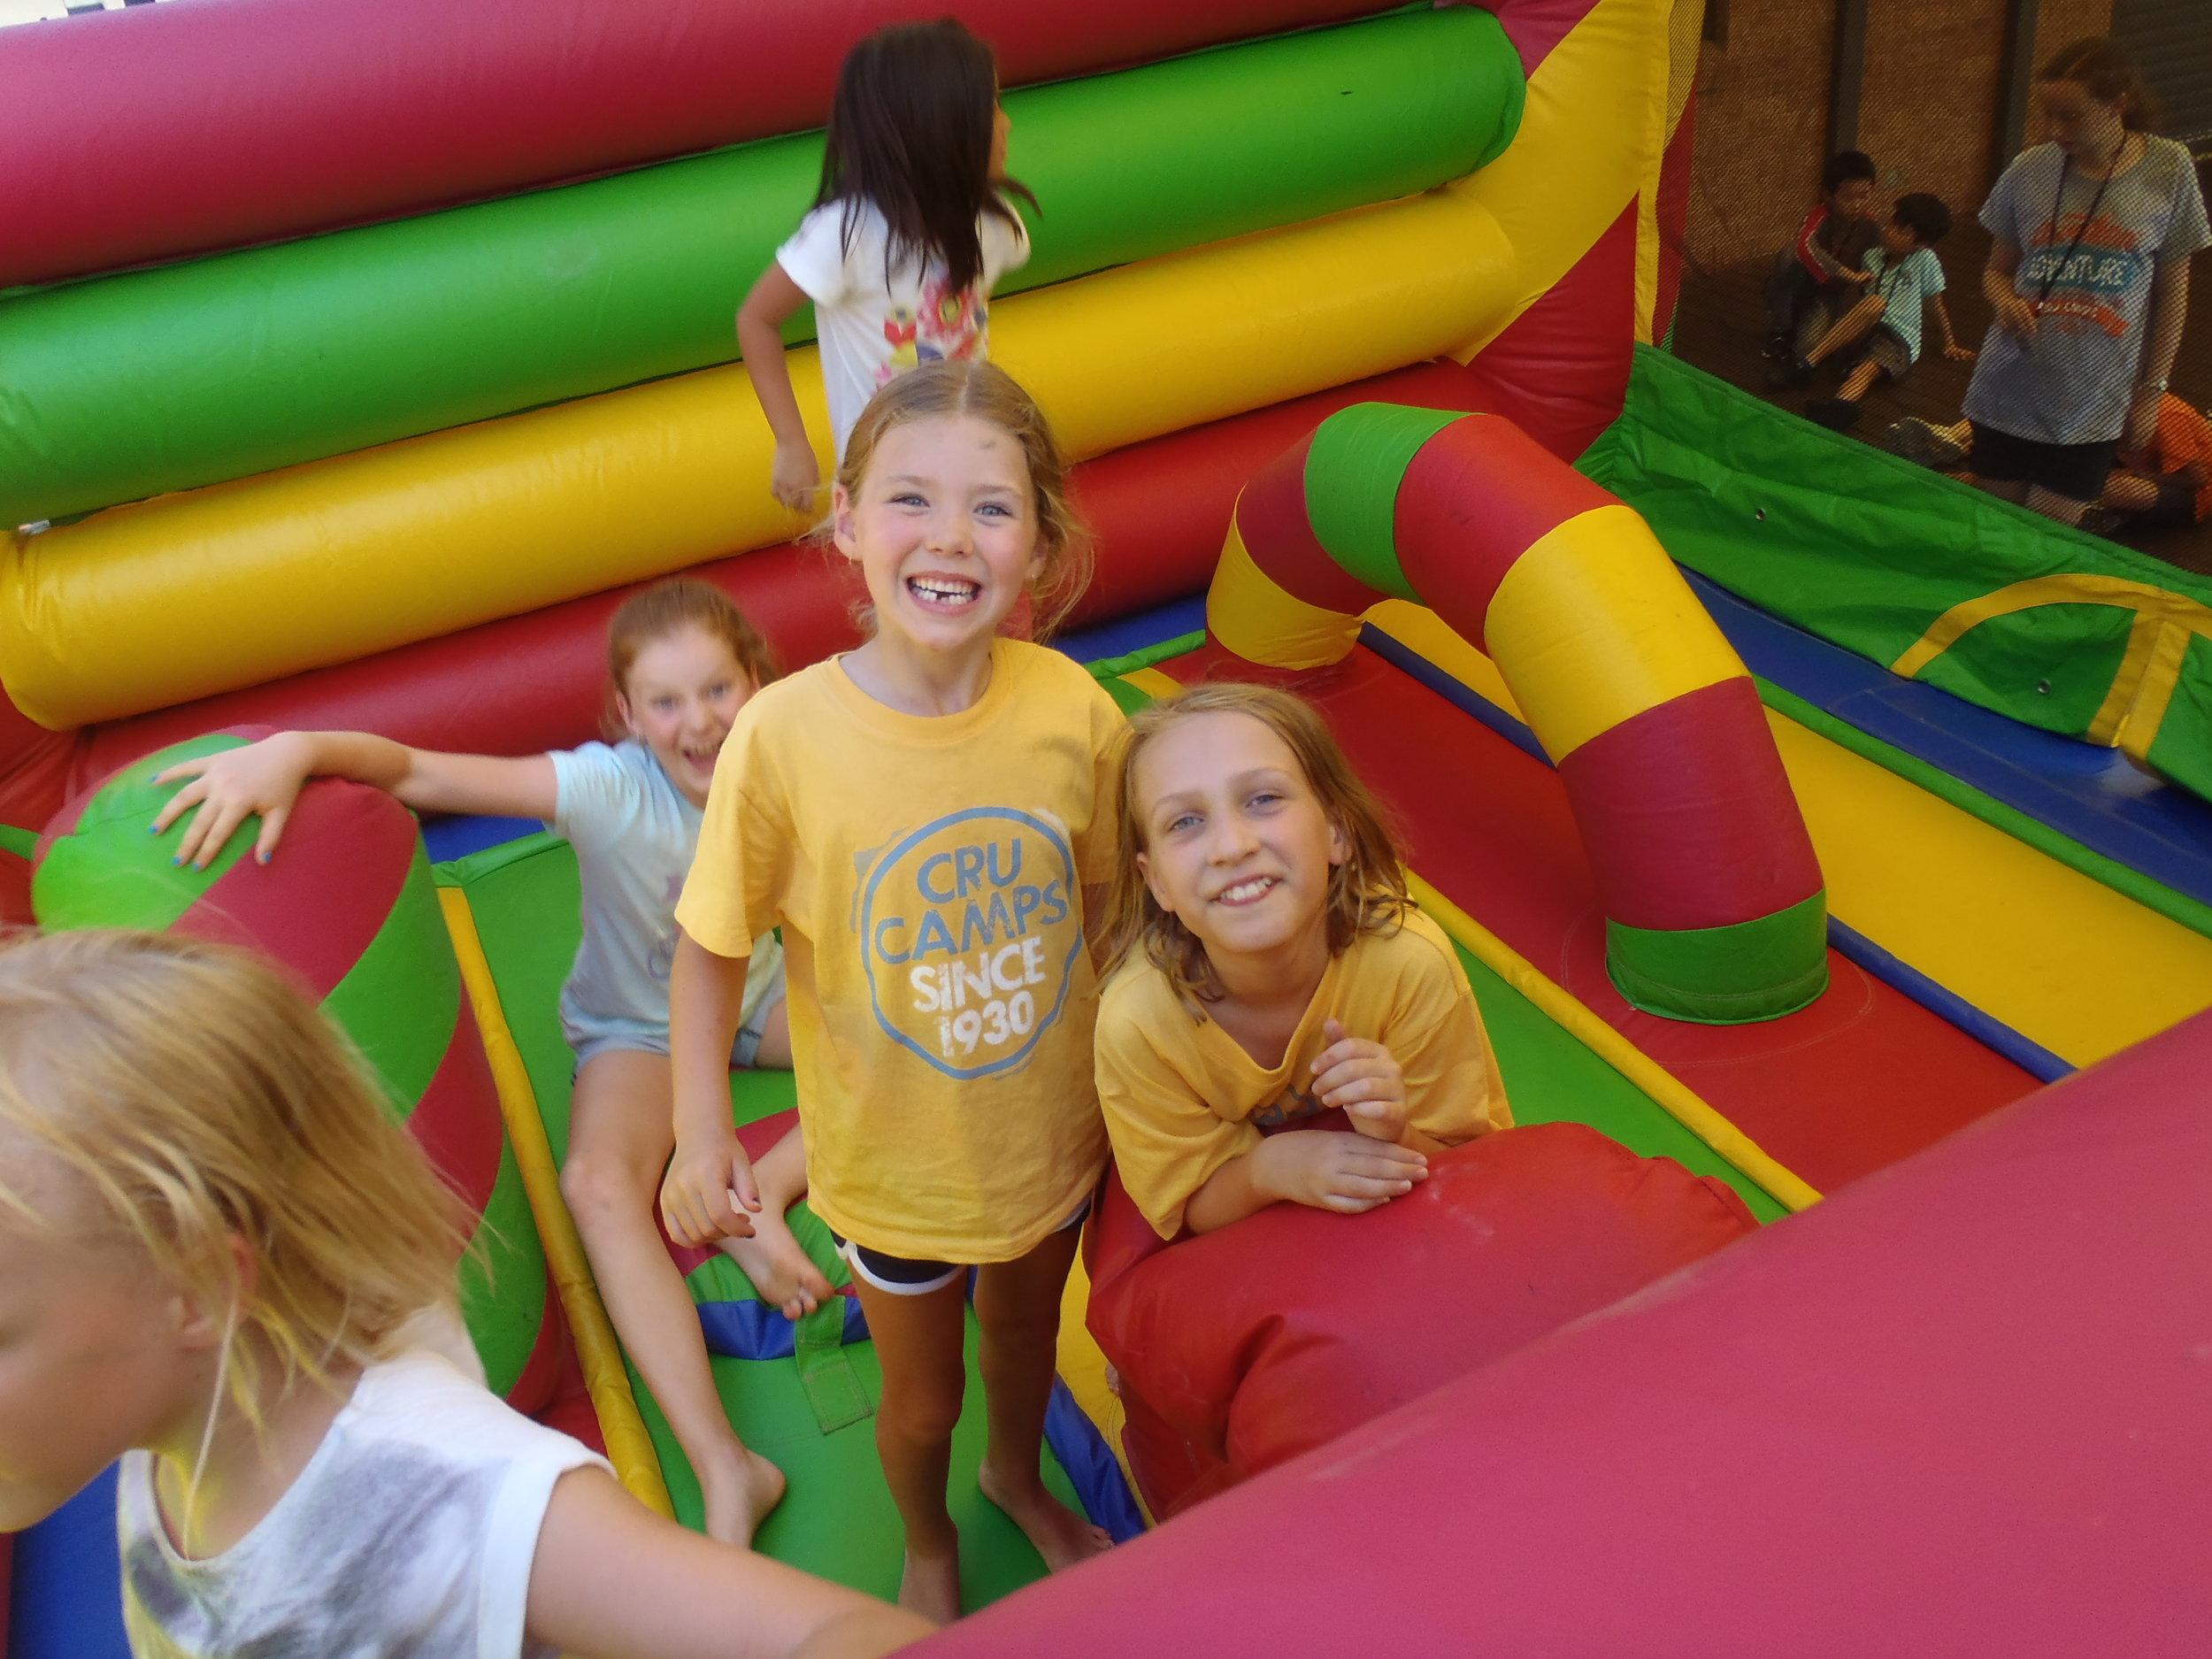 Kids on jumping castle 2.JPG